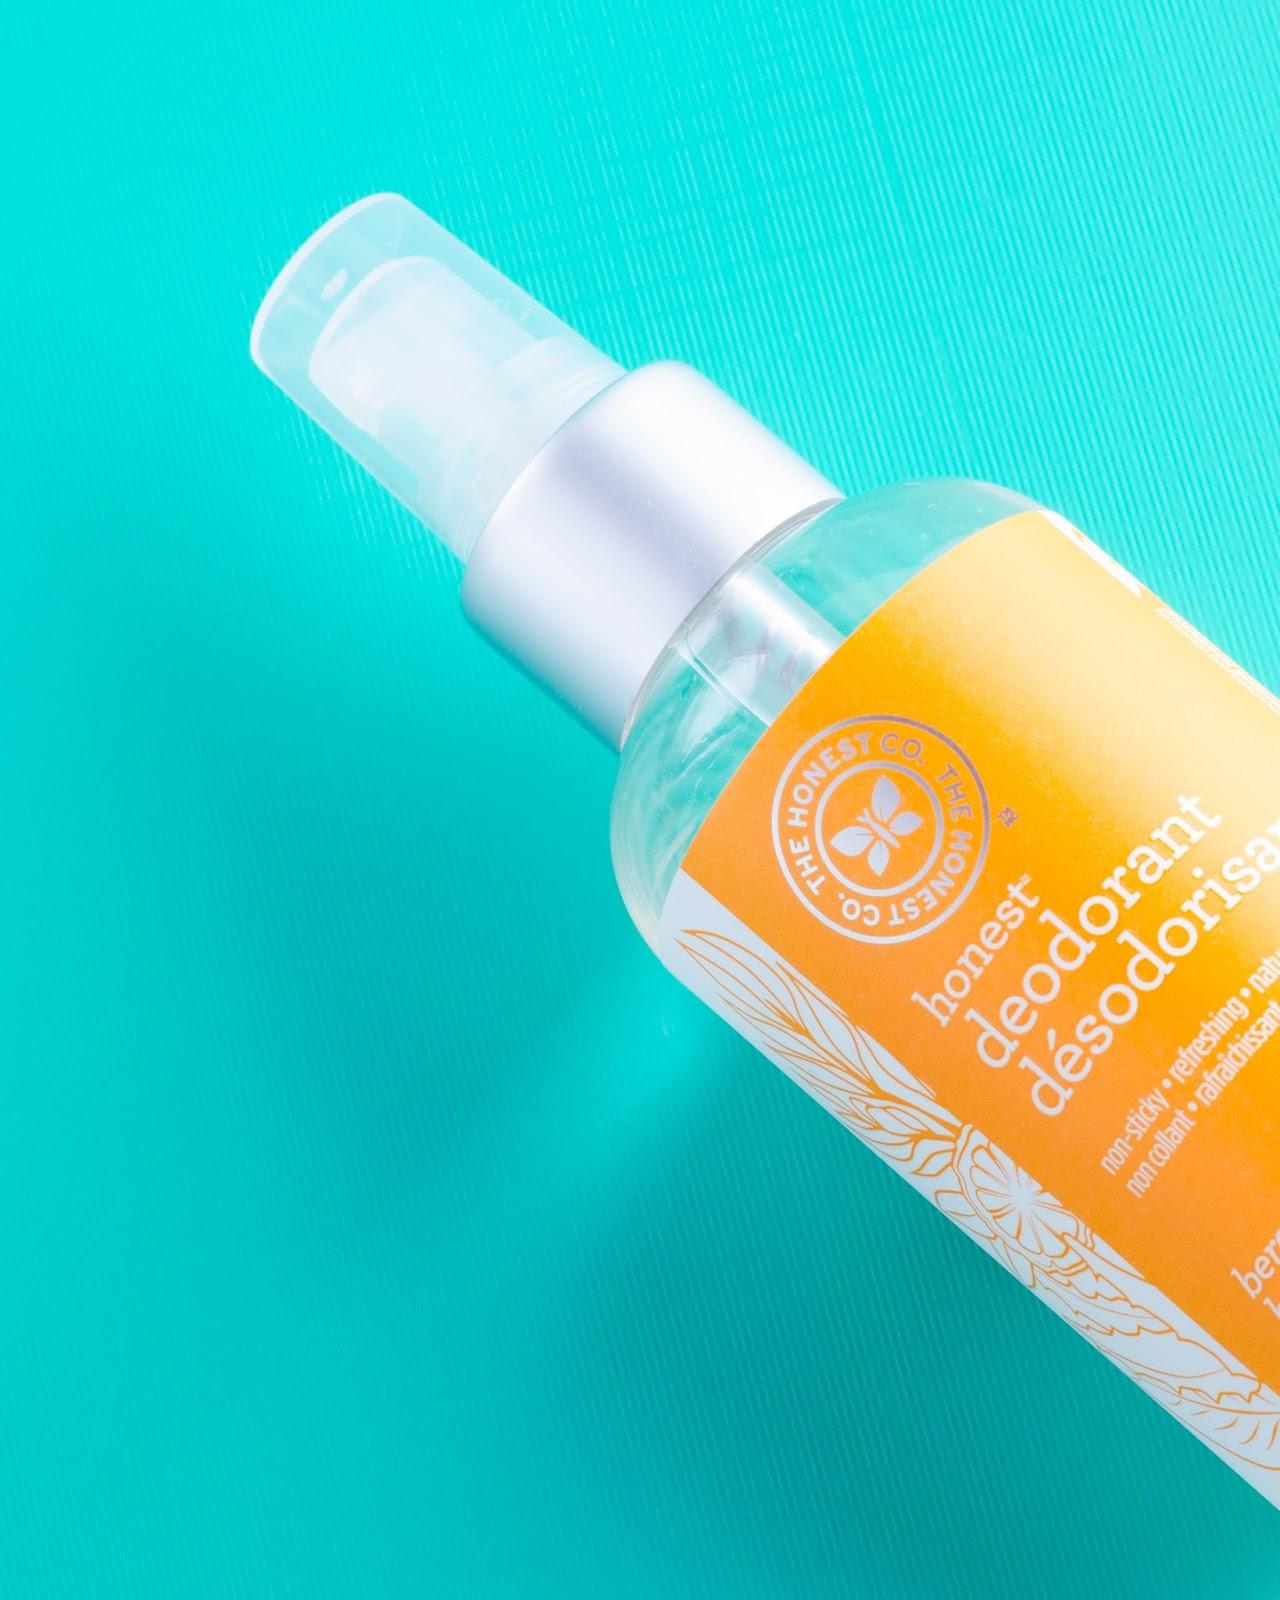 A close up of The Honest Company Honest Deodorant in Bergamot Sage Natural Deodorant